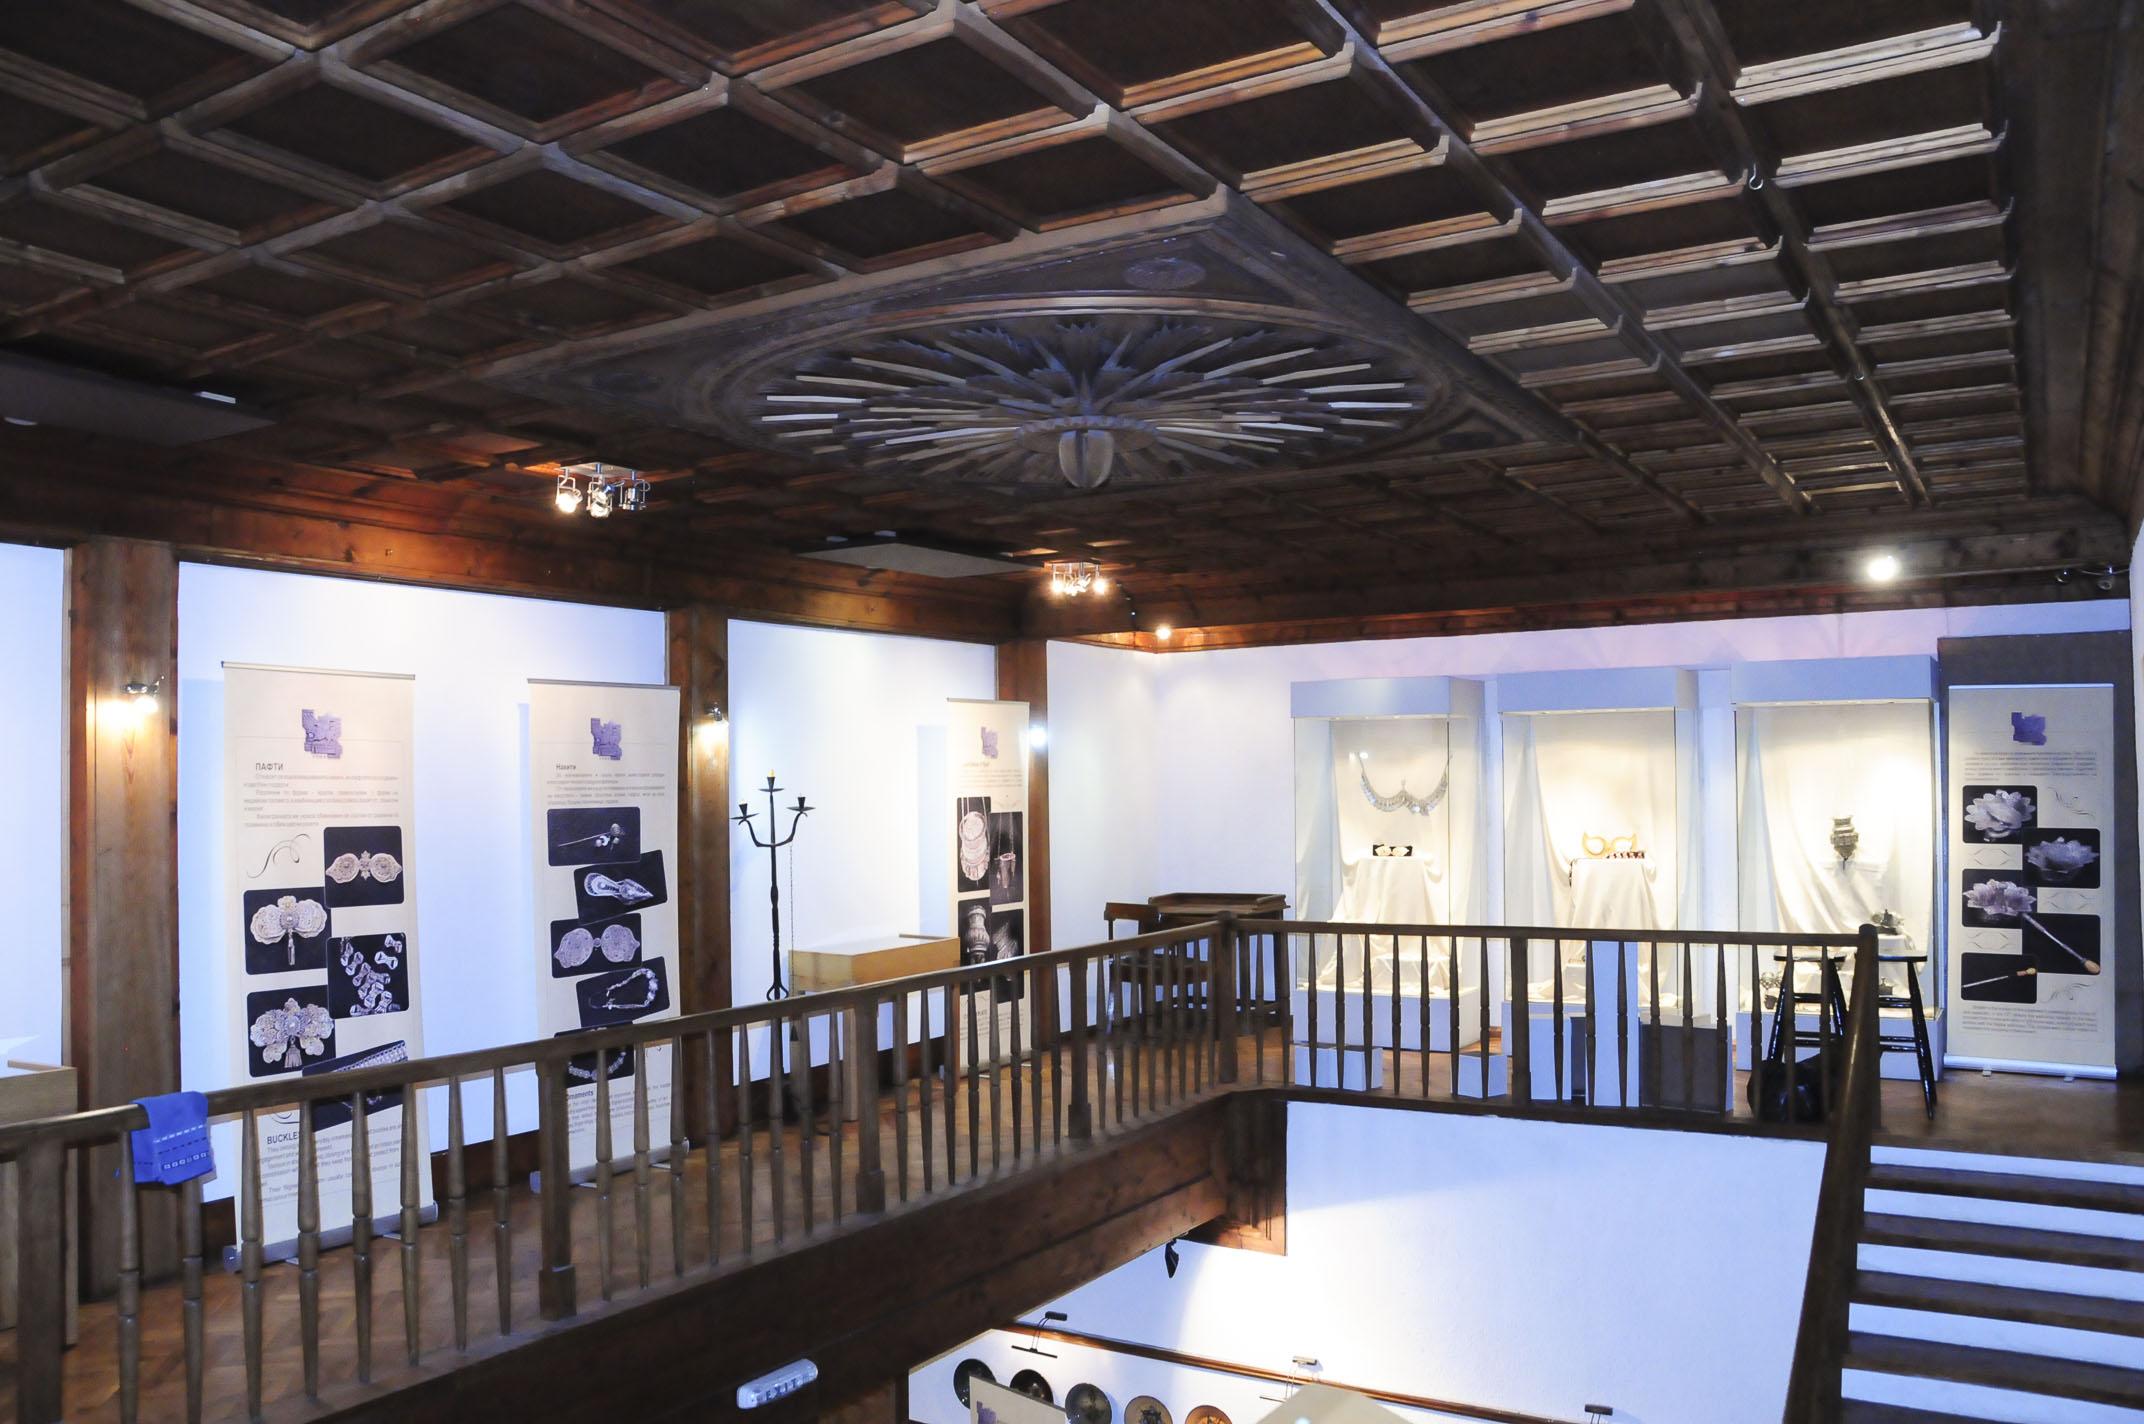 troyan-museum-ot-zlatnite-im-ruce-36